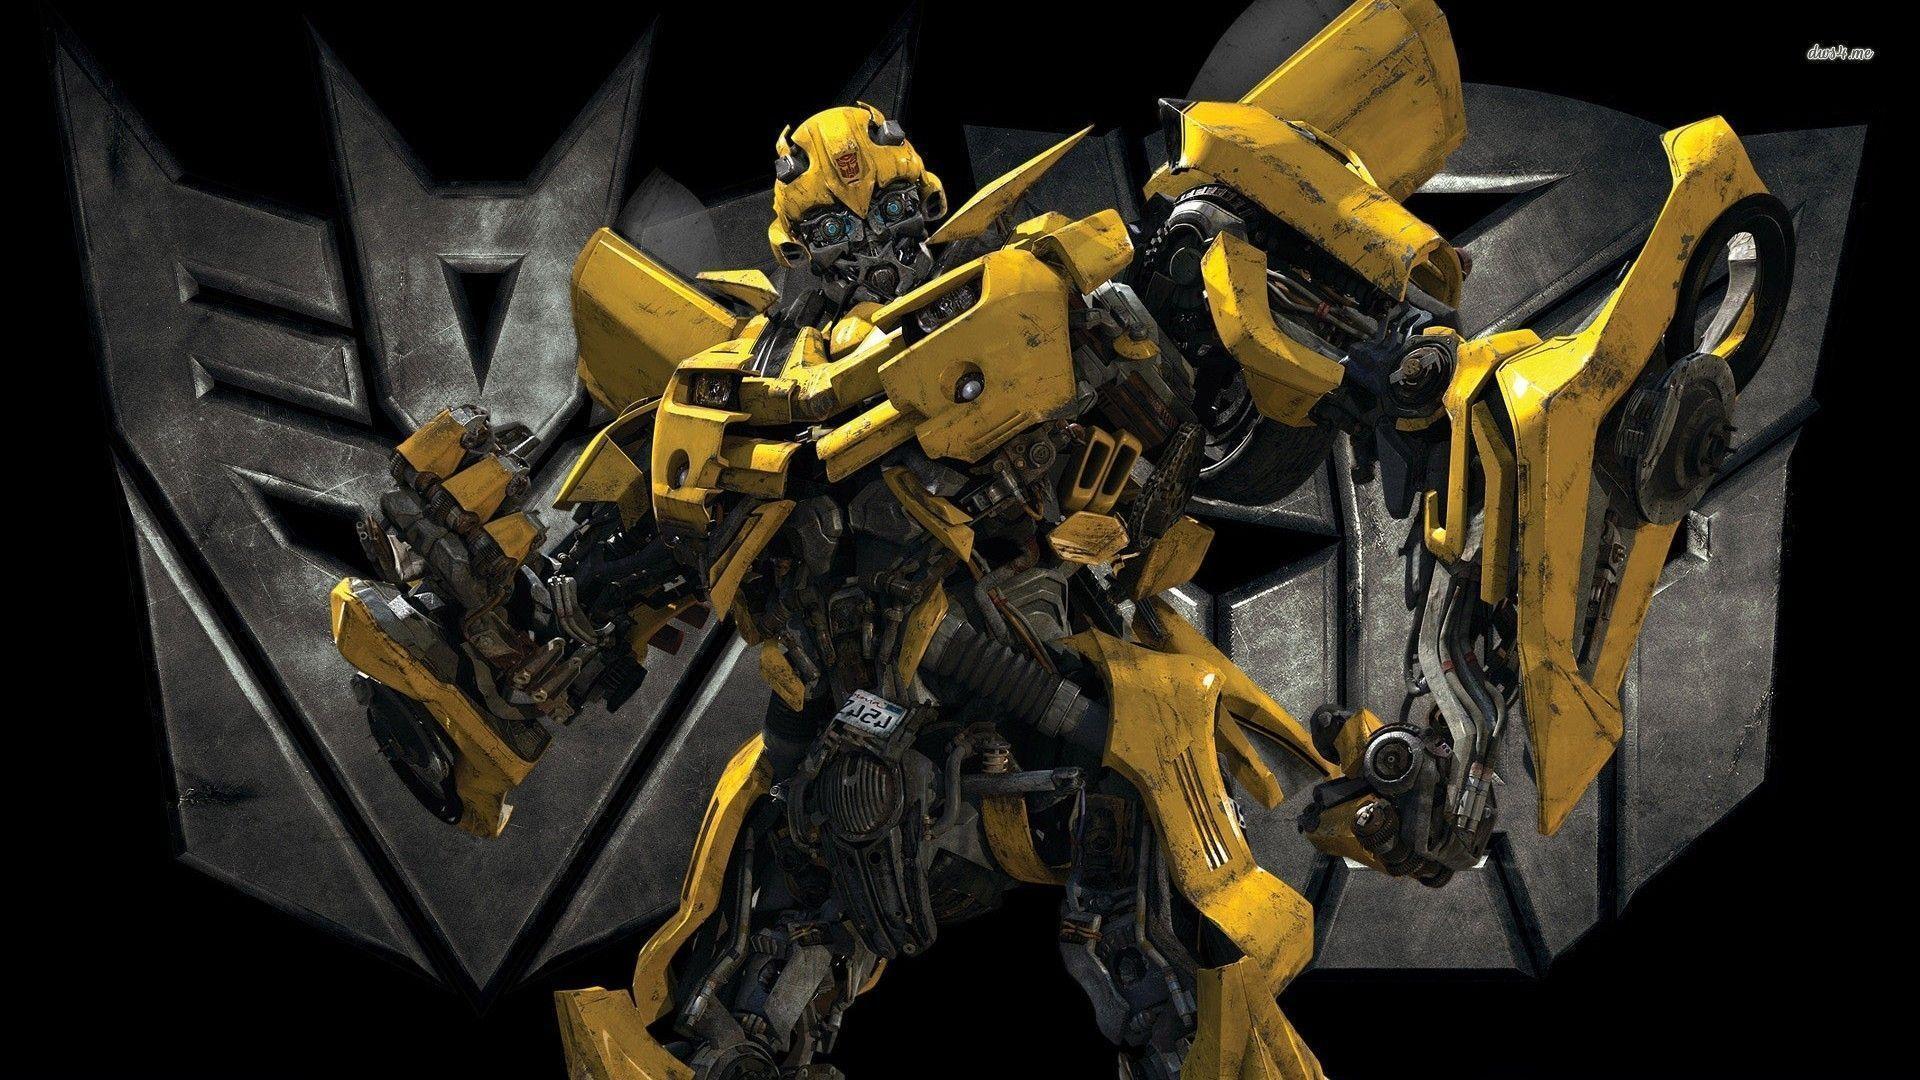 Transformers Bumblebee Wallpapers 1920x1080